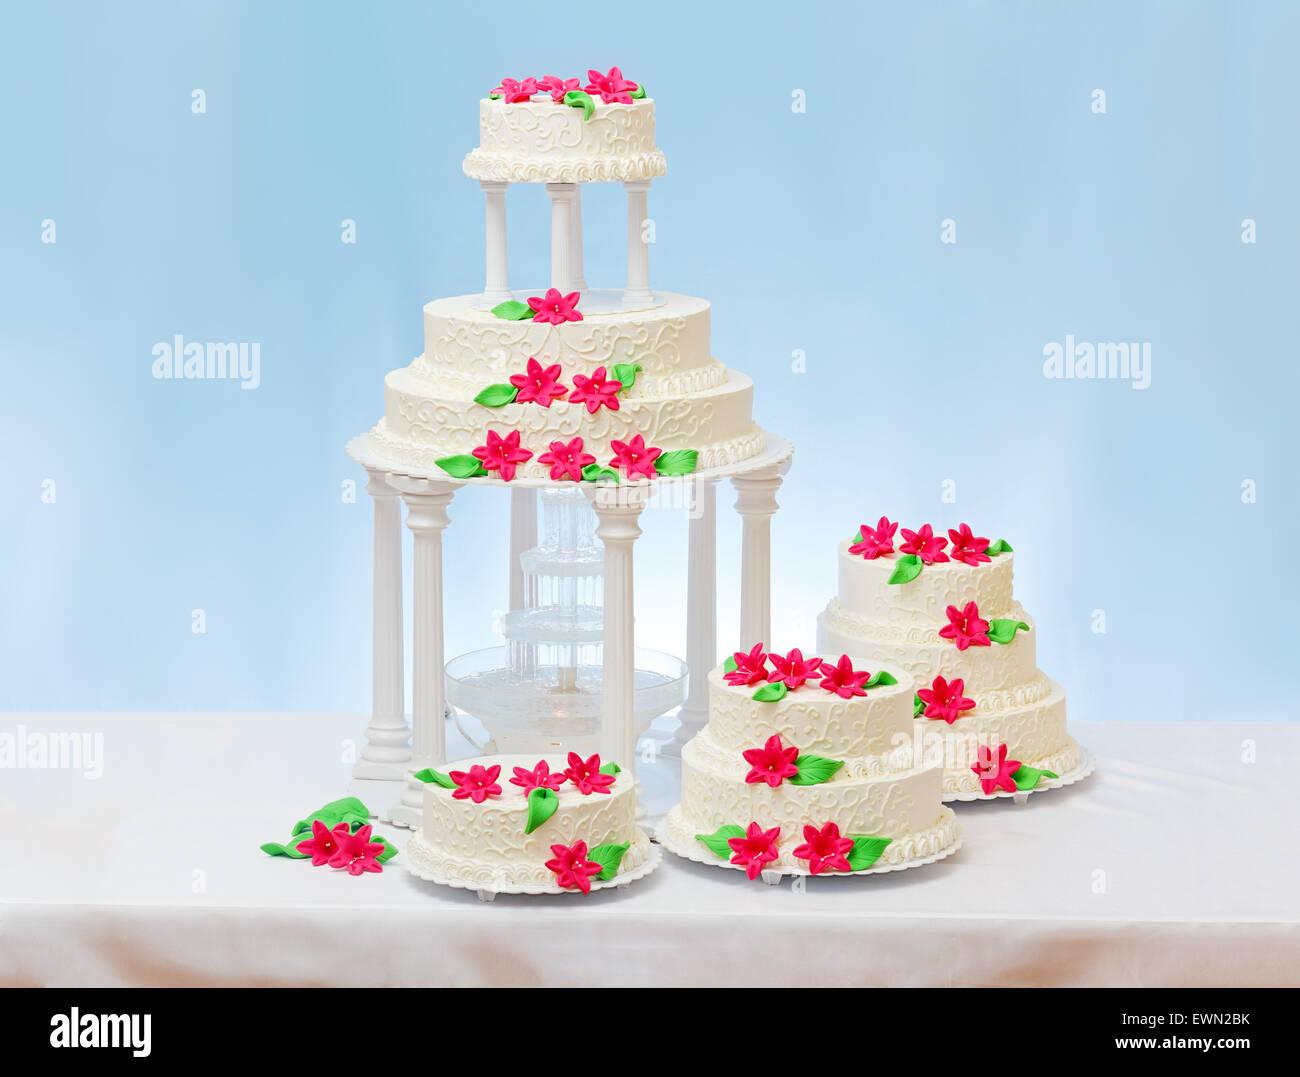 Multi Storey White Wedding Cakes With Pink Flower Decoration Stock